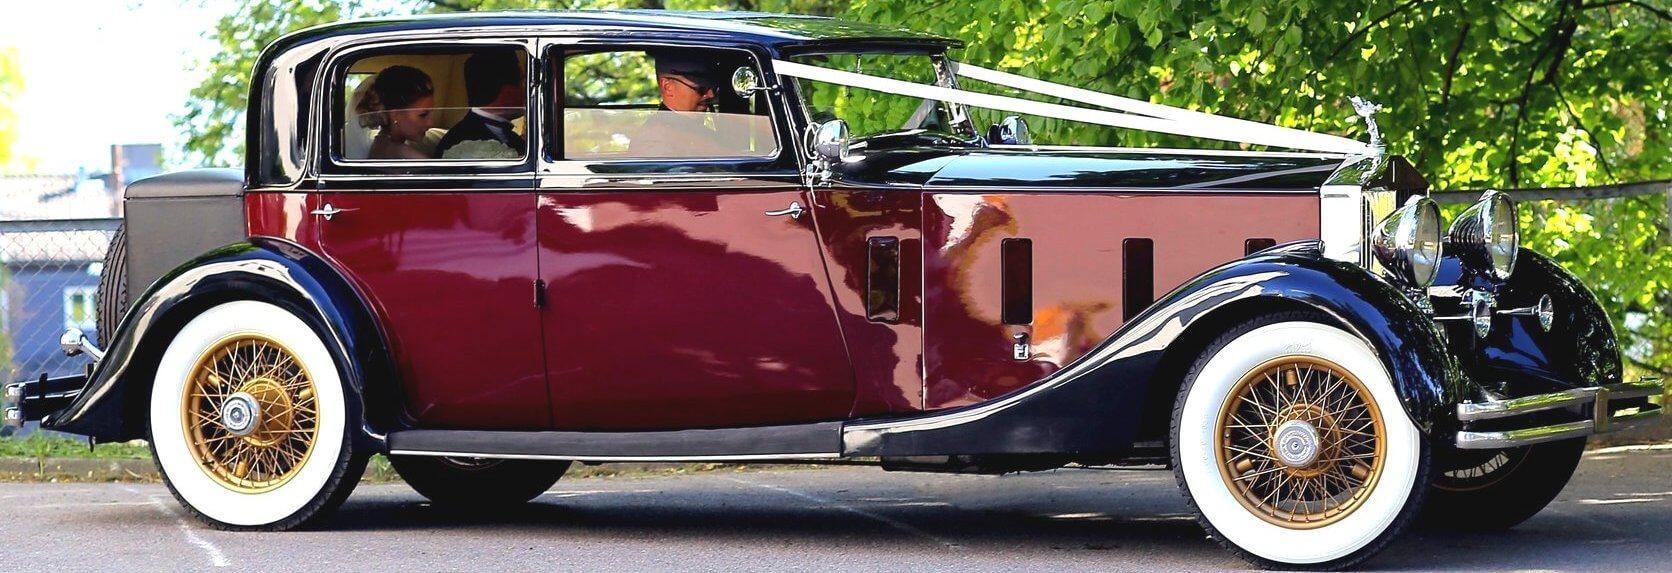 Rolls-Royce-Phantom-bryllupskjøring-1